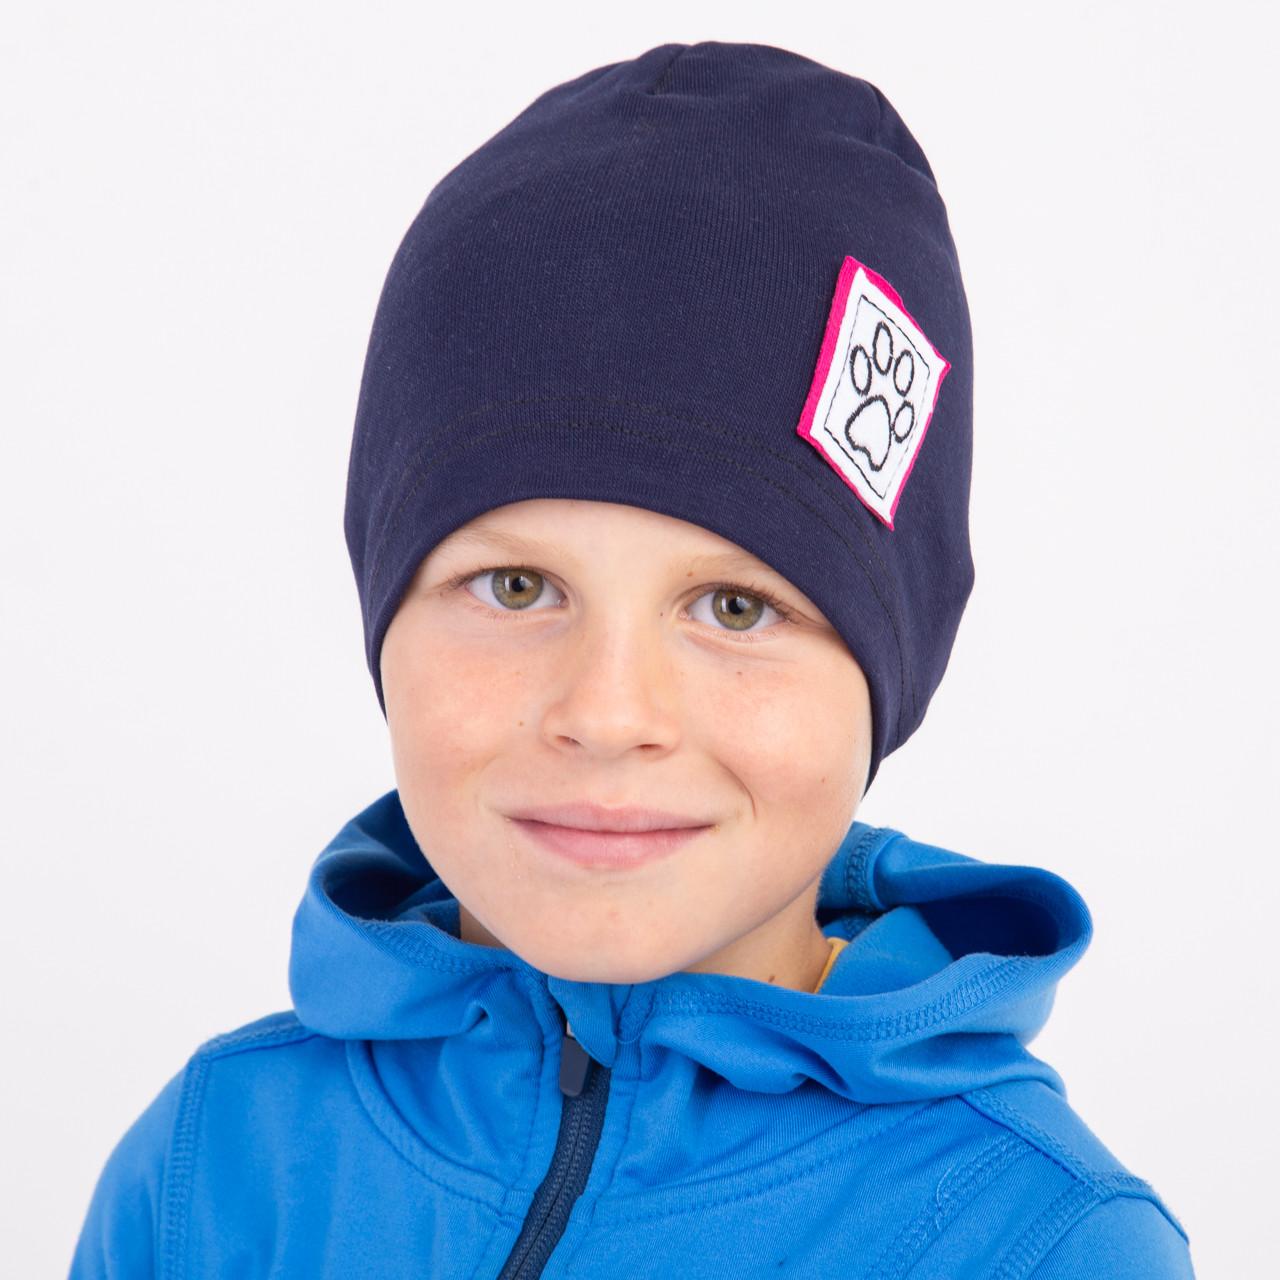 Осенняя шапка для мальчика - Арт 2225